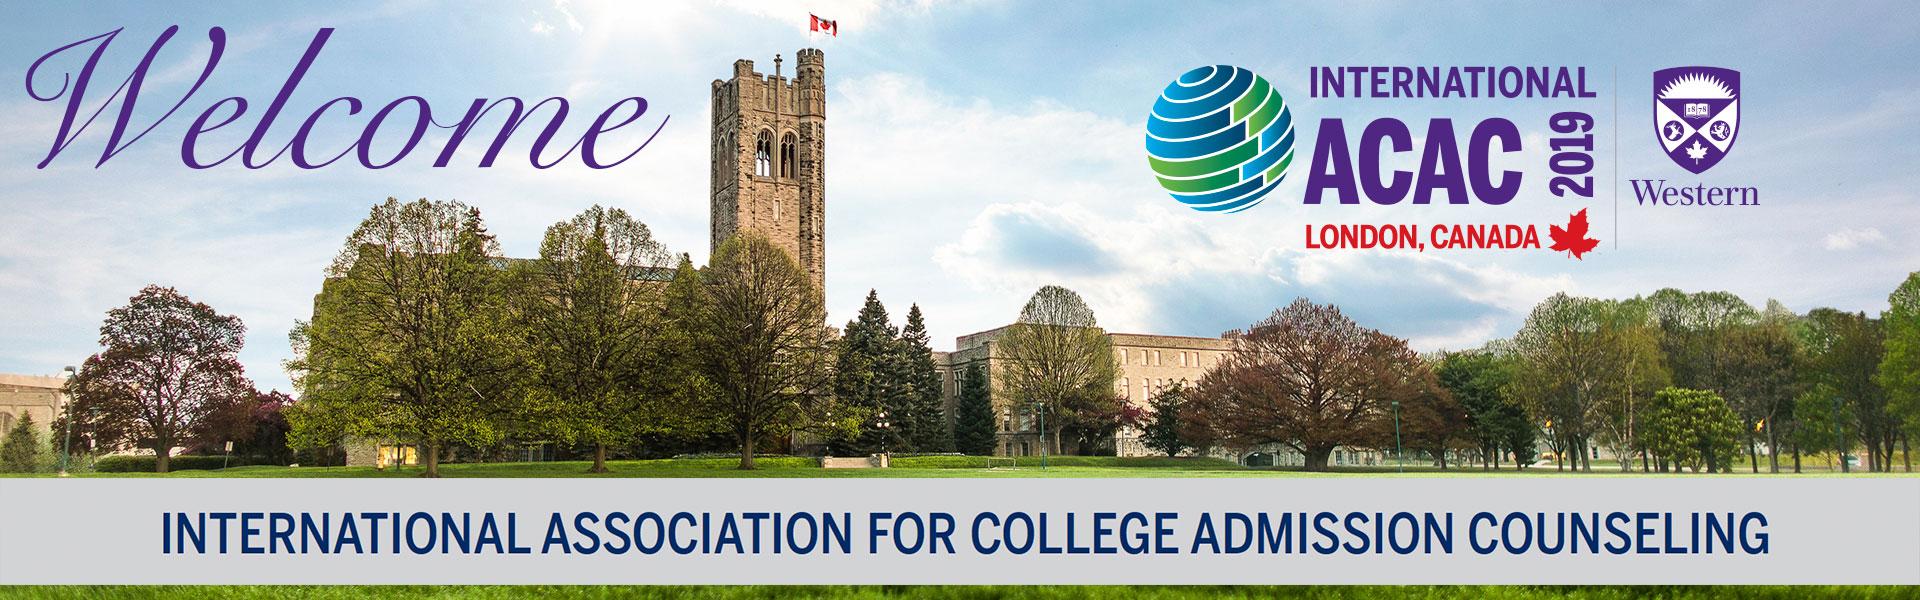 International ACAC 2019 - Western University